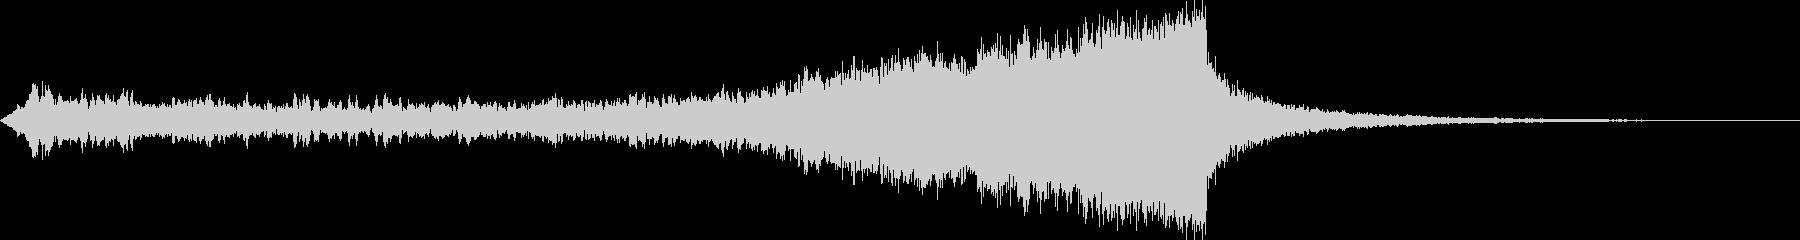 CINEMATIC RISER_26の未再生の波形